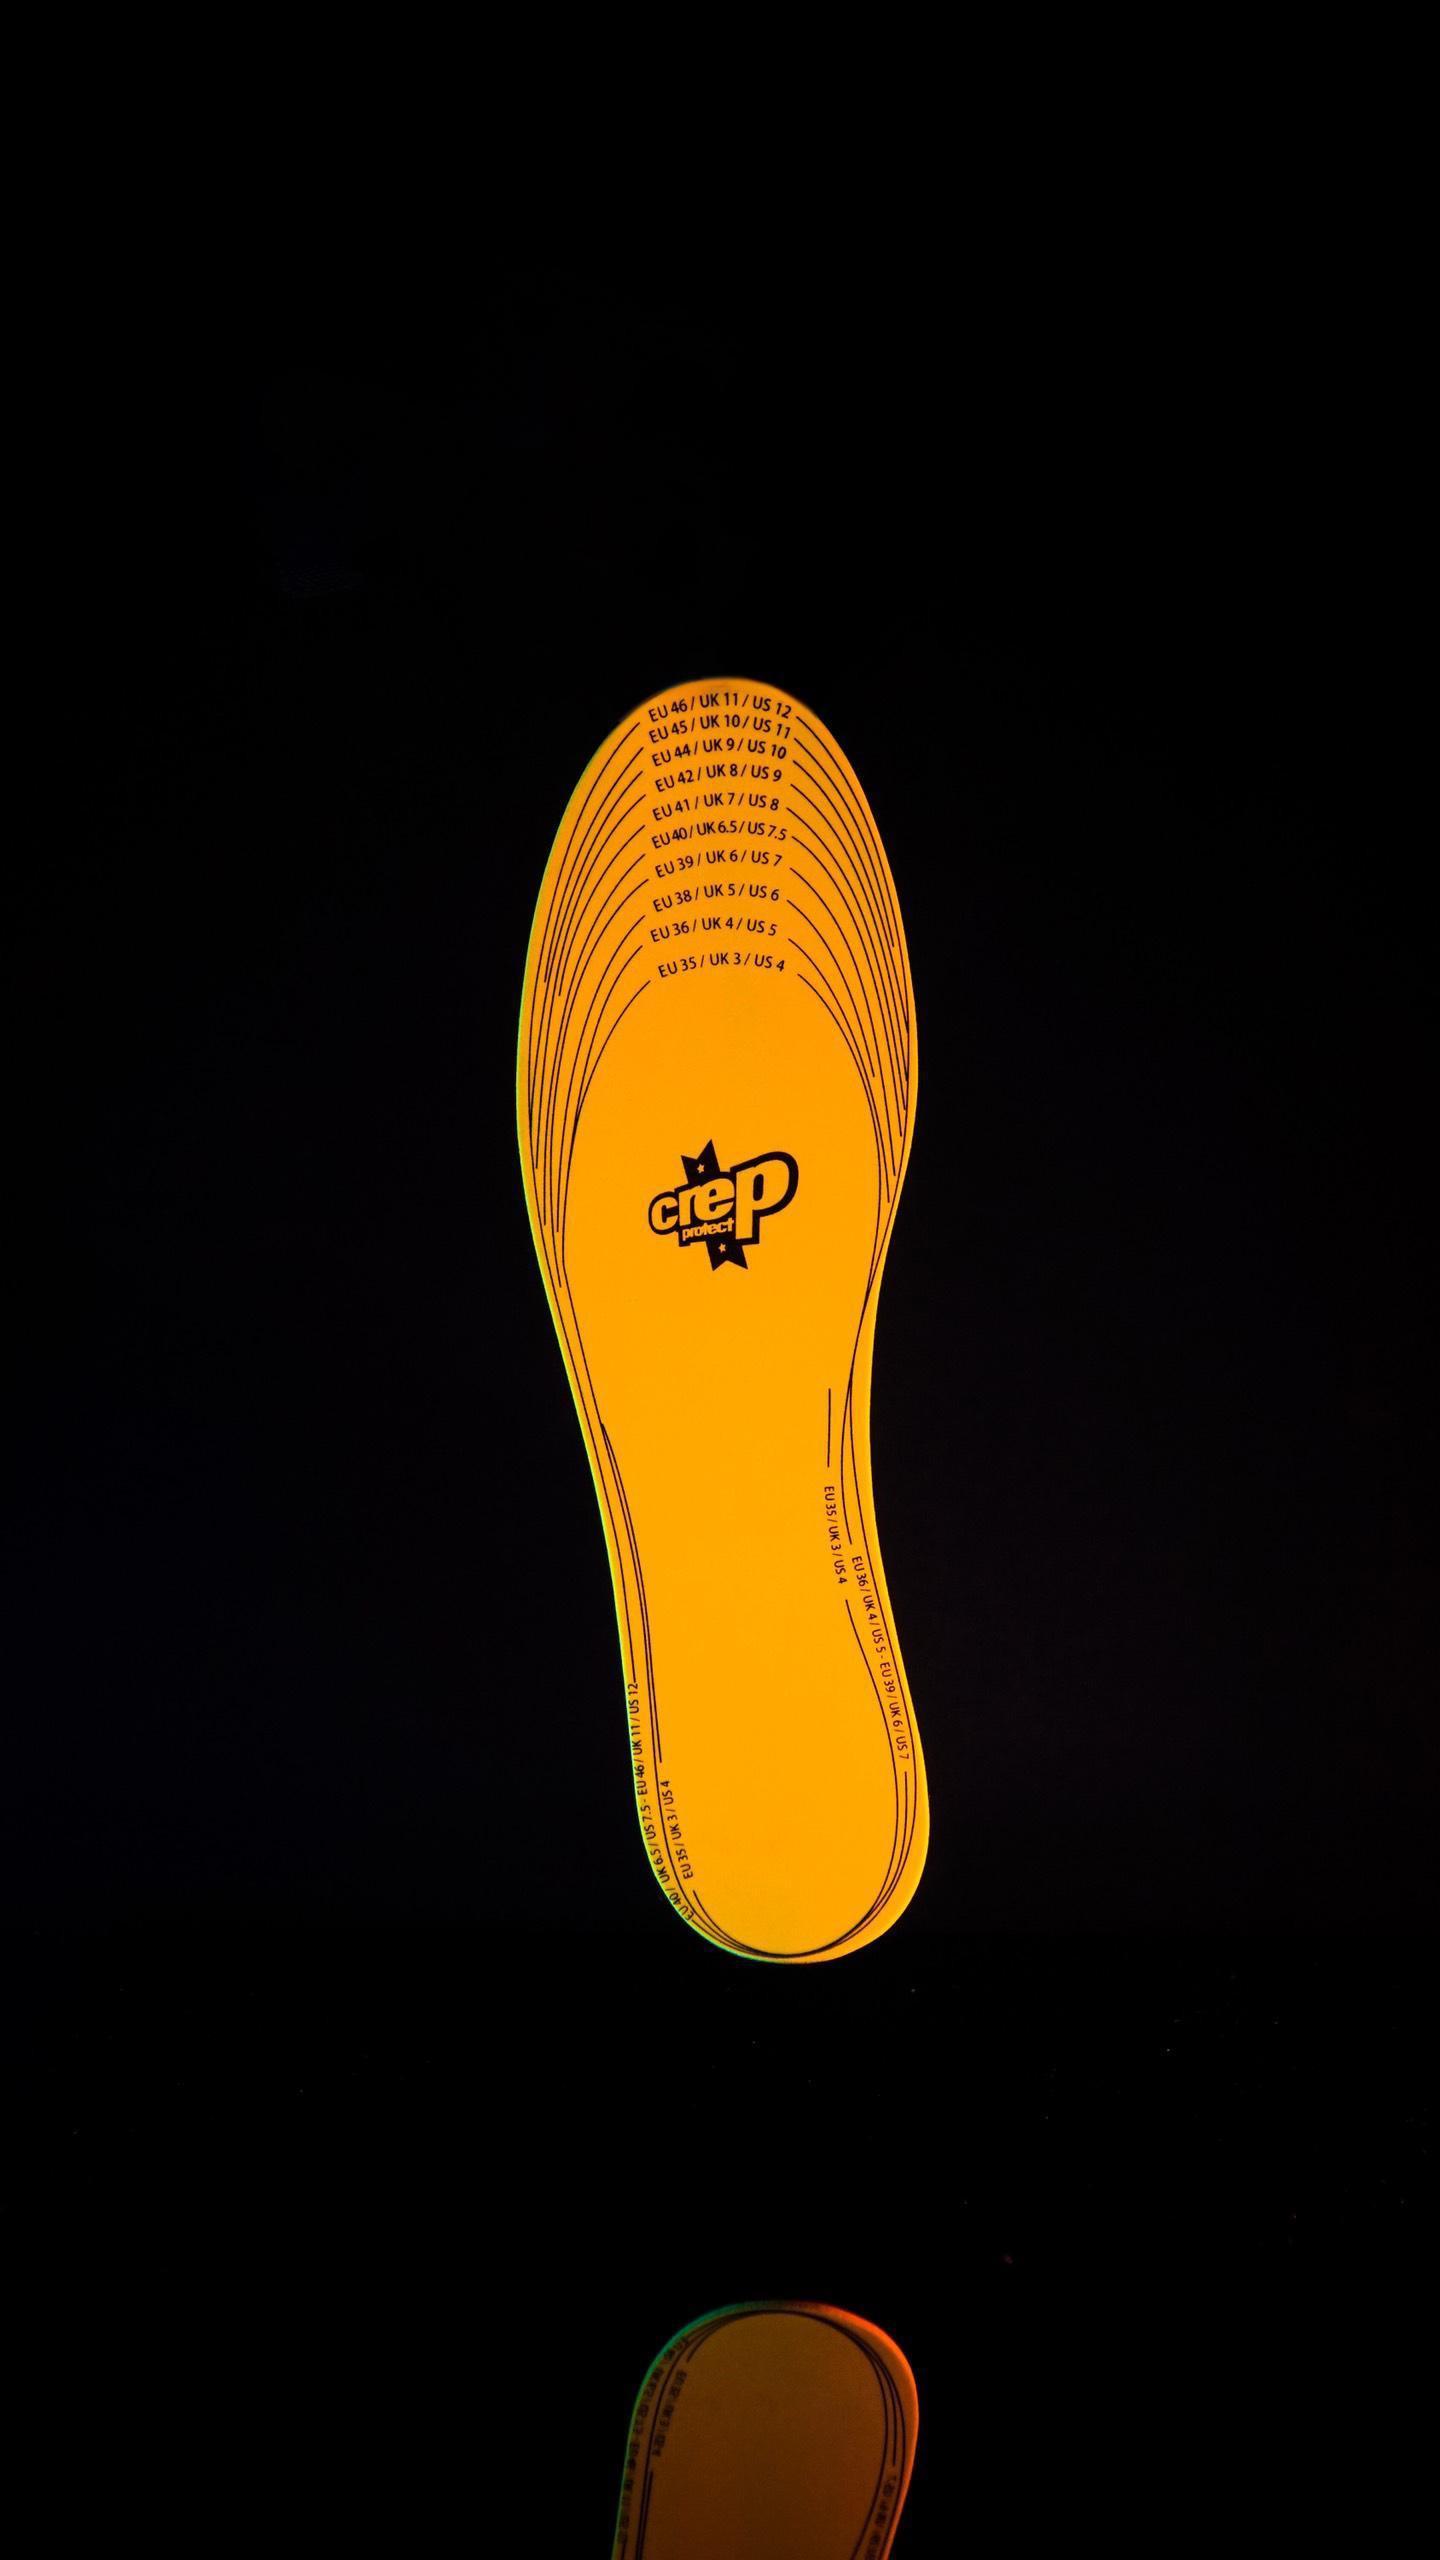 Lót giày Crep (IMPACT INSOLE)